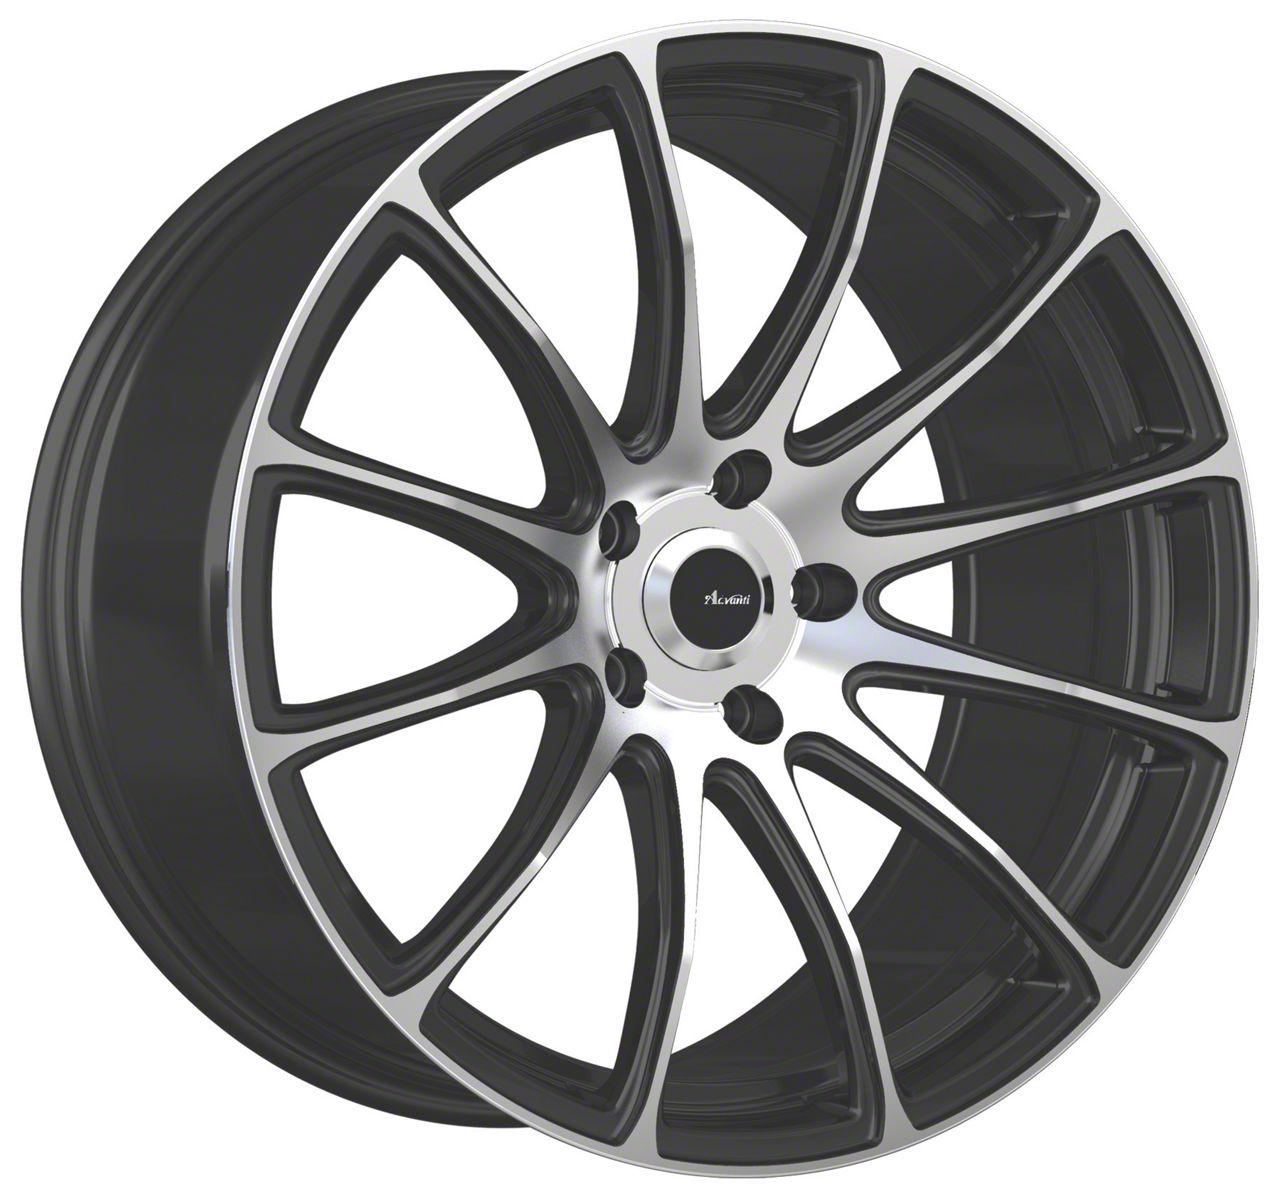 Advanti Svelto Matte Black Machined Wheel - 19x9.5 (05-14 All)